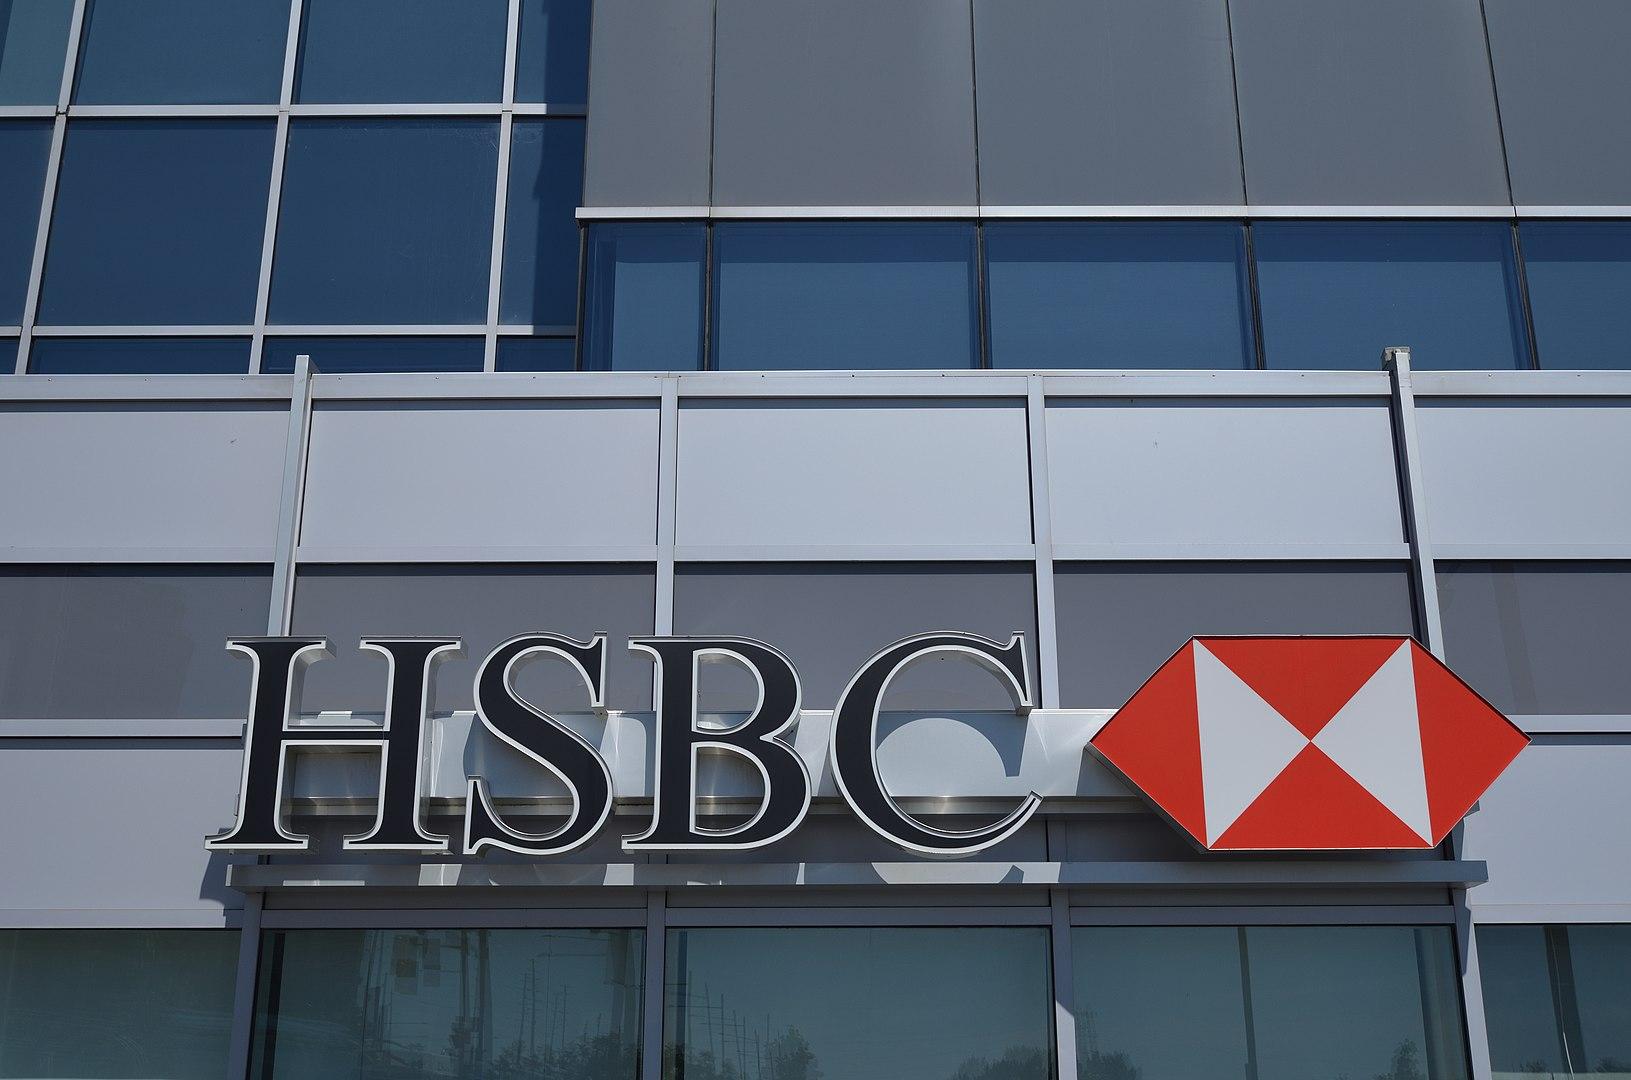 FILE HSBC Building Markham Liberty Square Markham